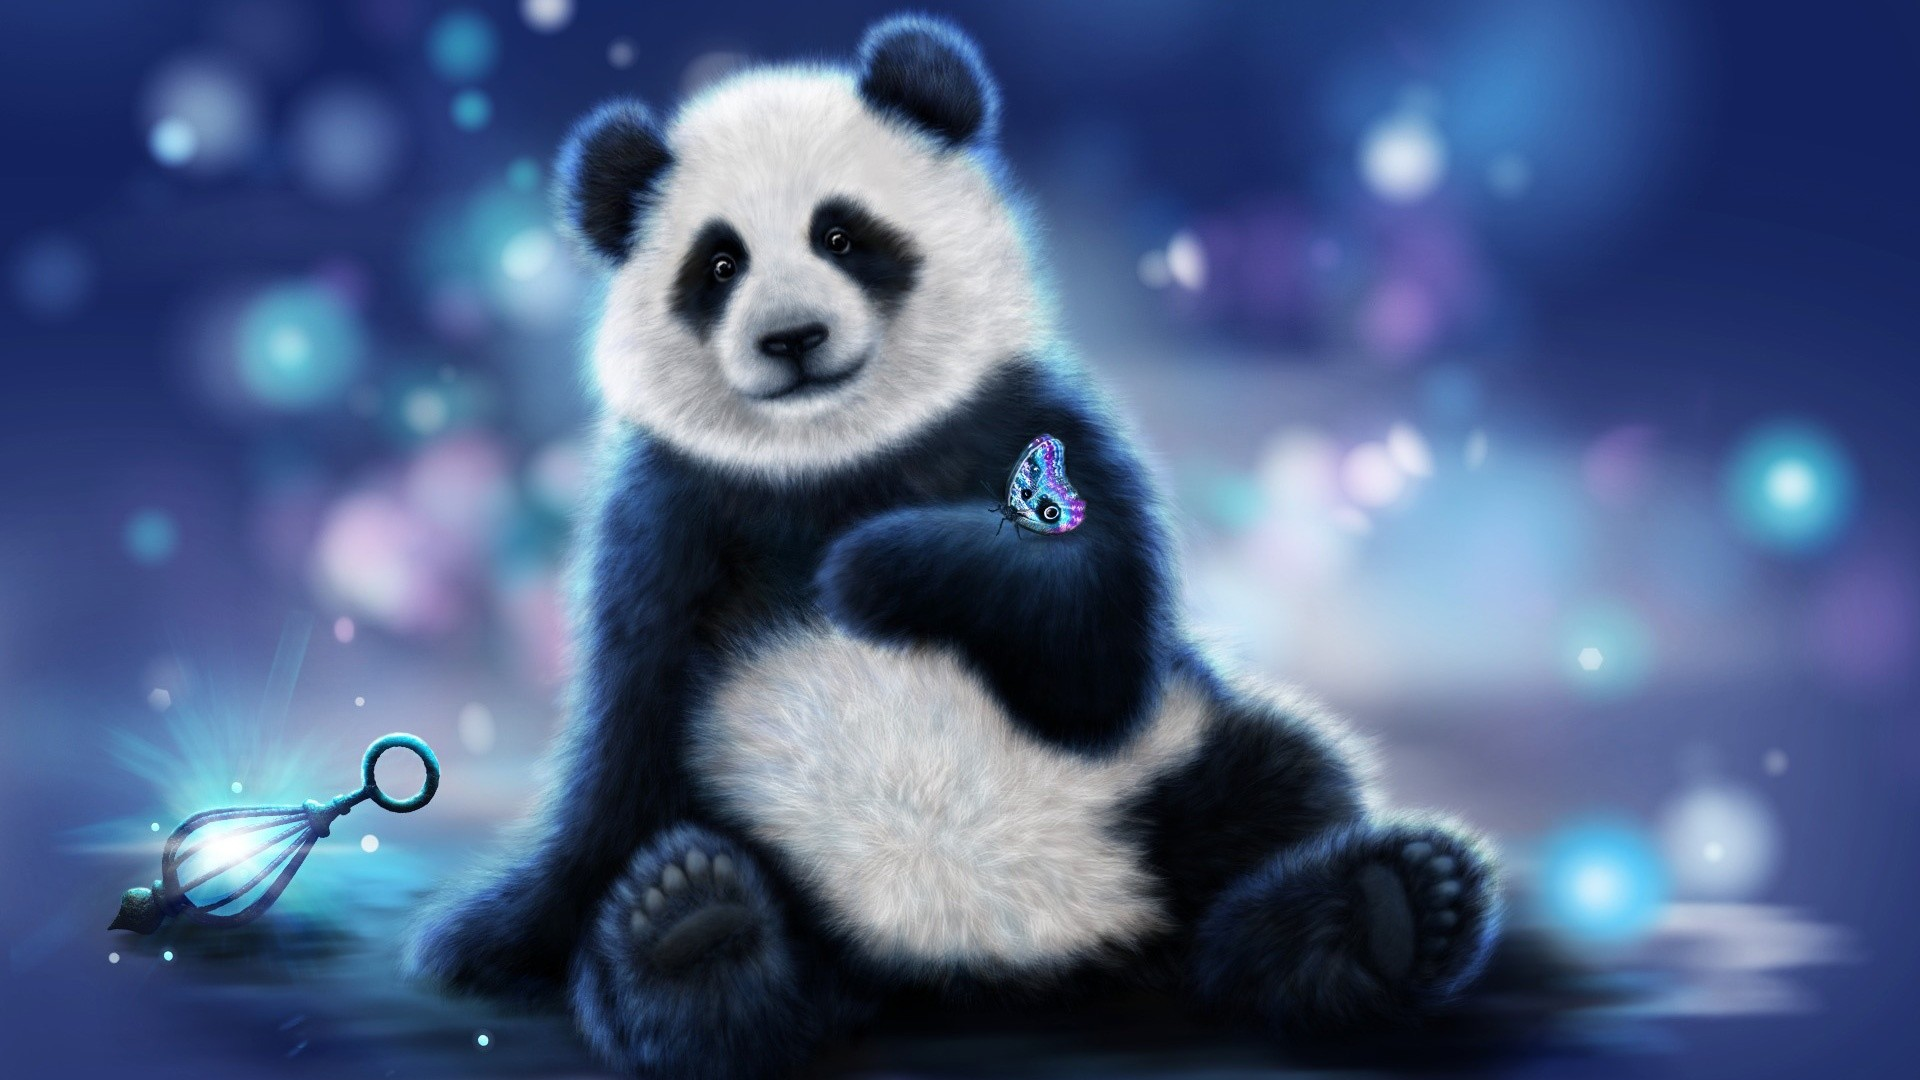 Free 3d Wallpaper Apps Anime Panda Wallpaper 70 Images